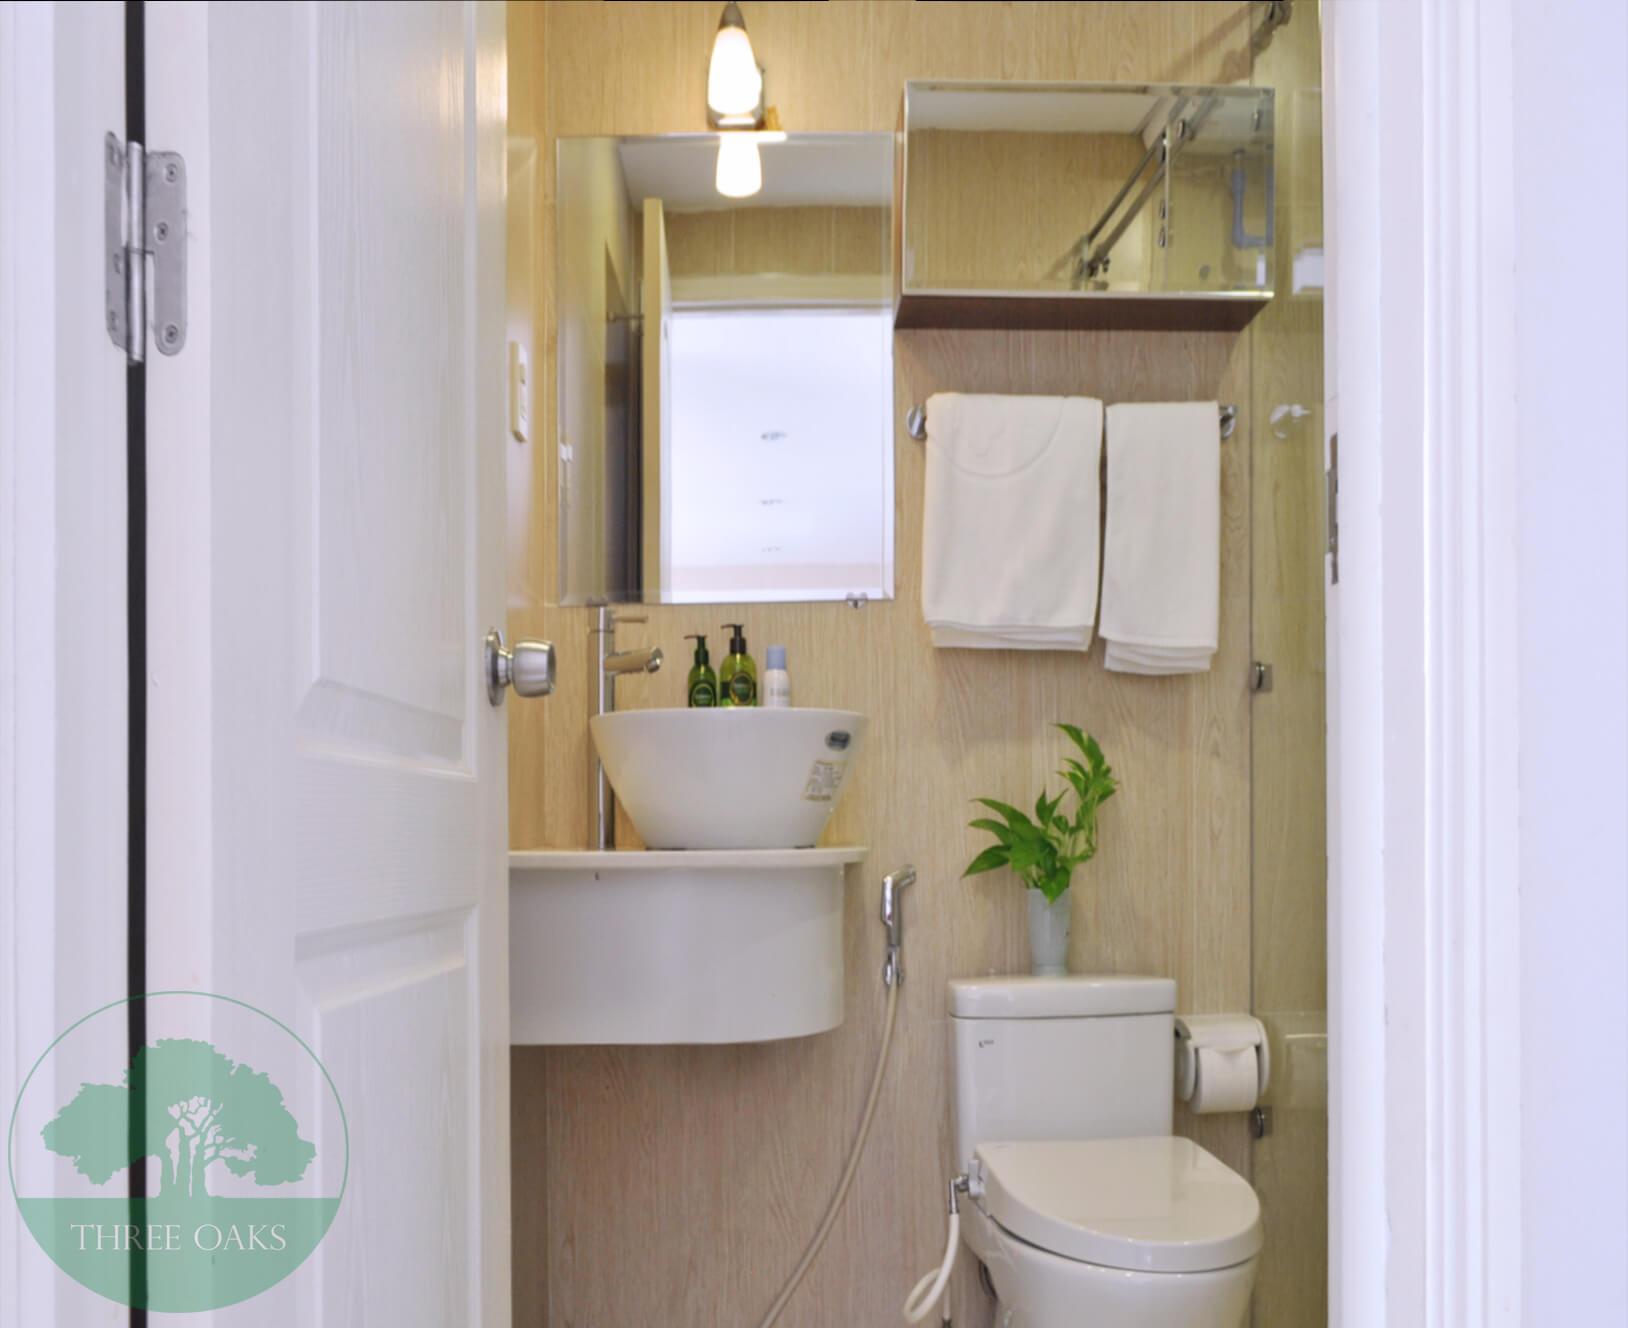 three-oaks-1-serviced-apartment-STUDIO-CITY-VIEW-Floor-11